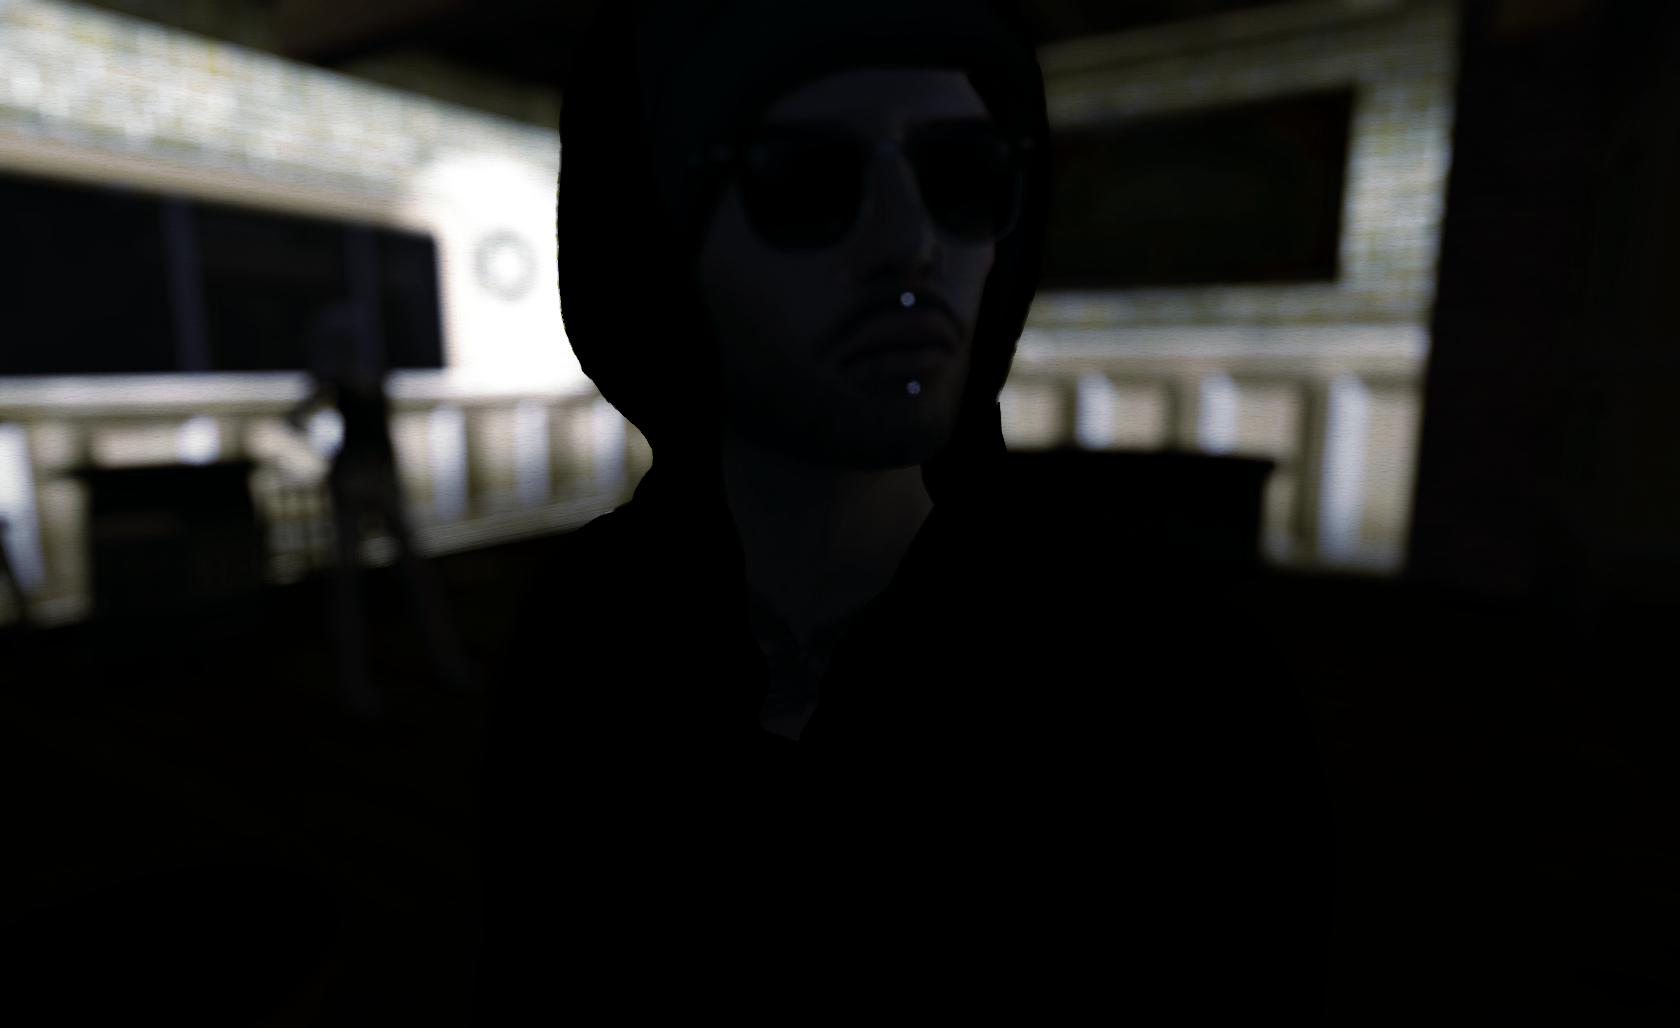 Wallpaper : people, black, dark, night, 3D, shadow